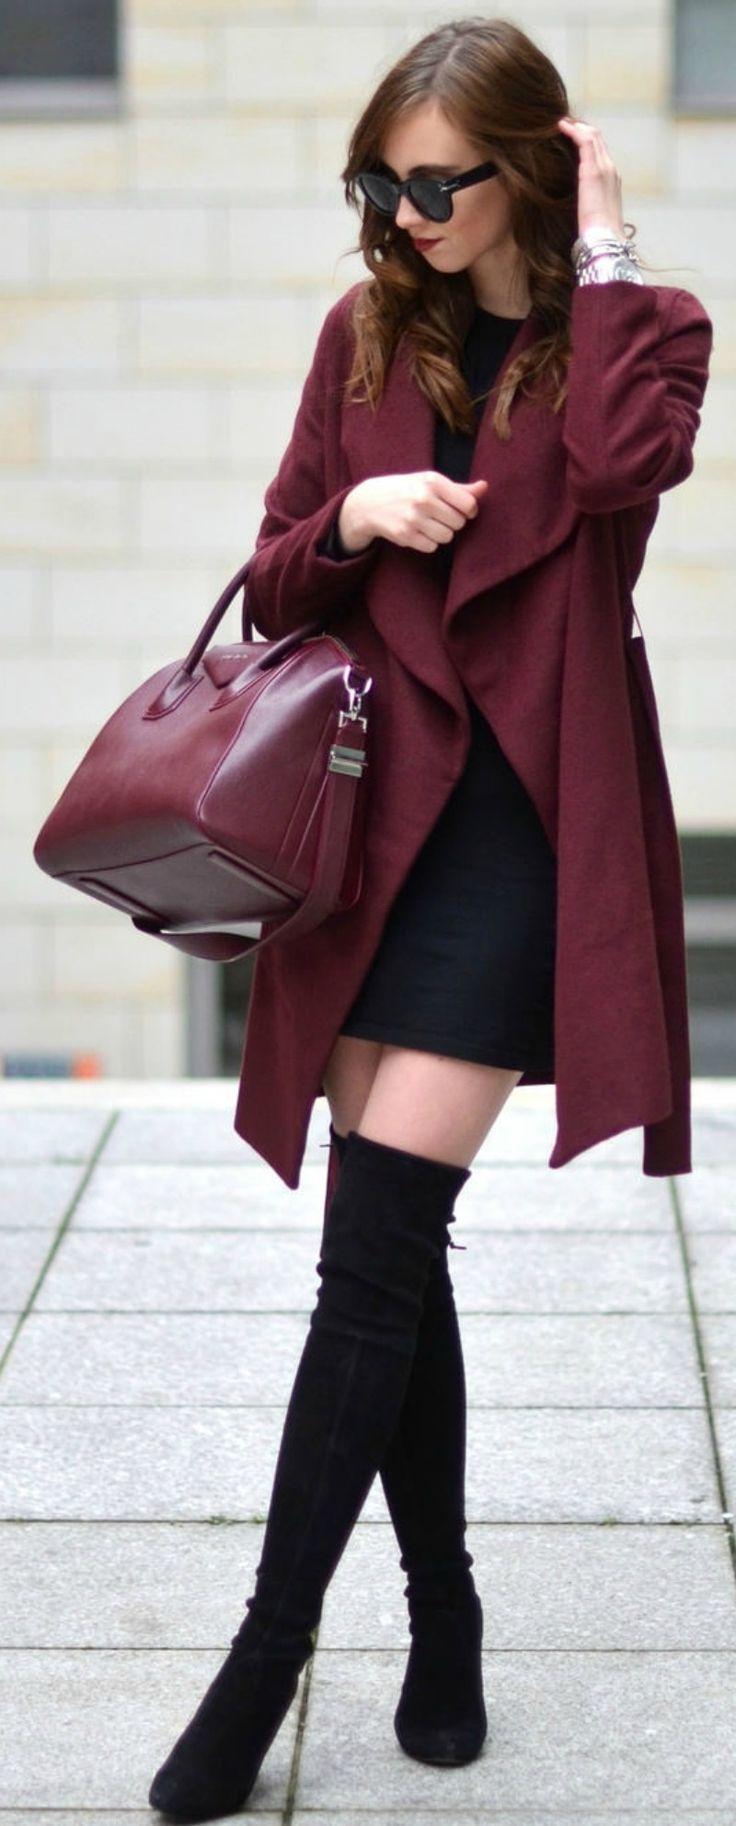 Barbora Ondrackova + thigh high boots + little black dress + matching burgundy coat + bag Coat: Medicine, Dress: Zara, Boots: Stuart Weitzman, Bag: Givenchy.